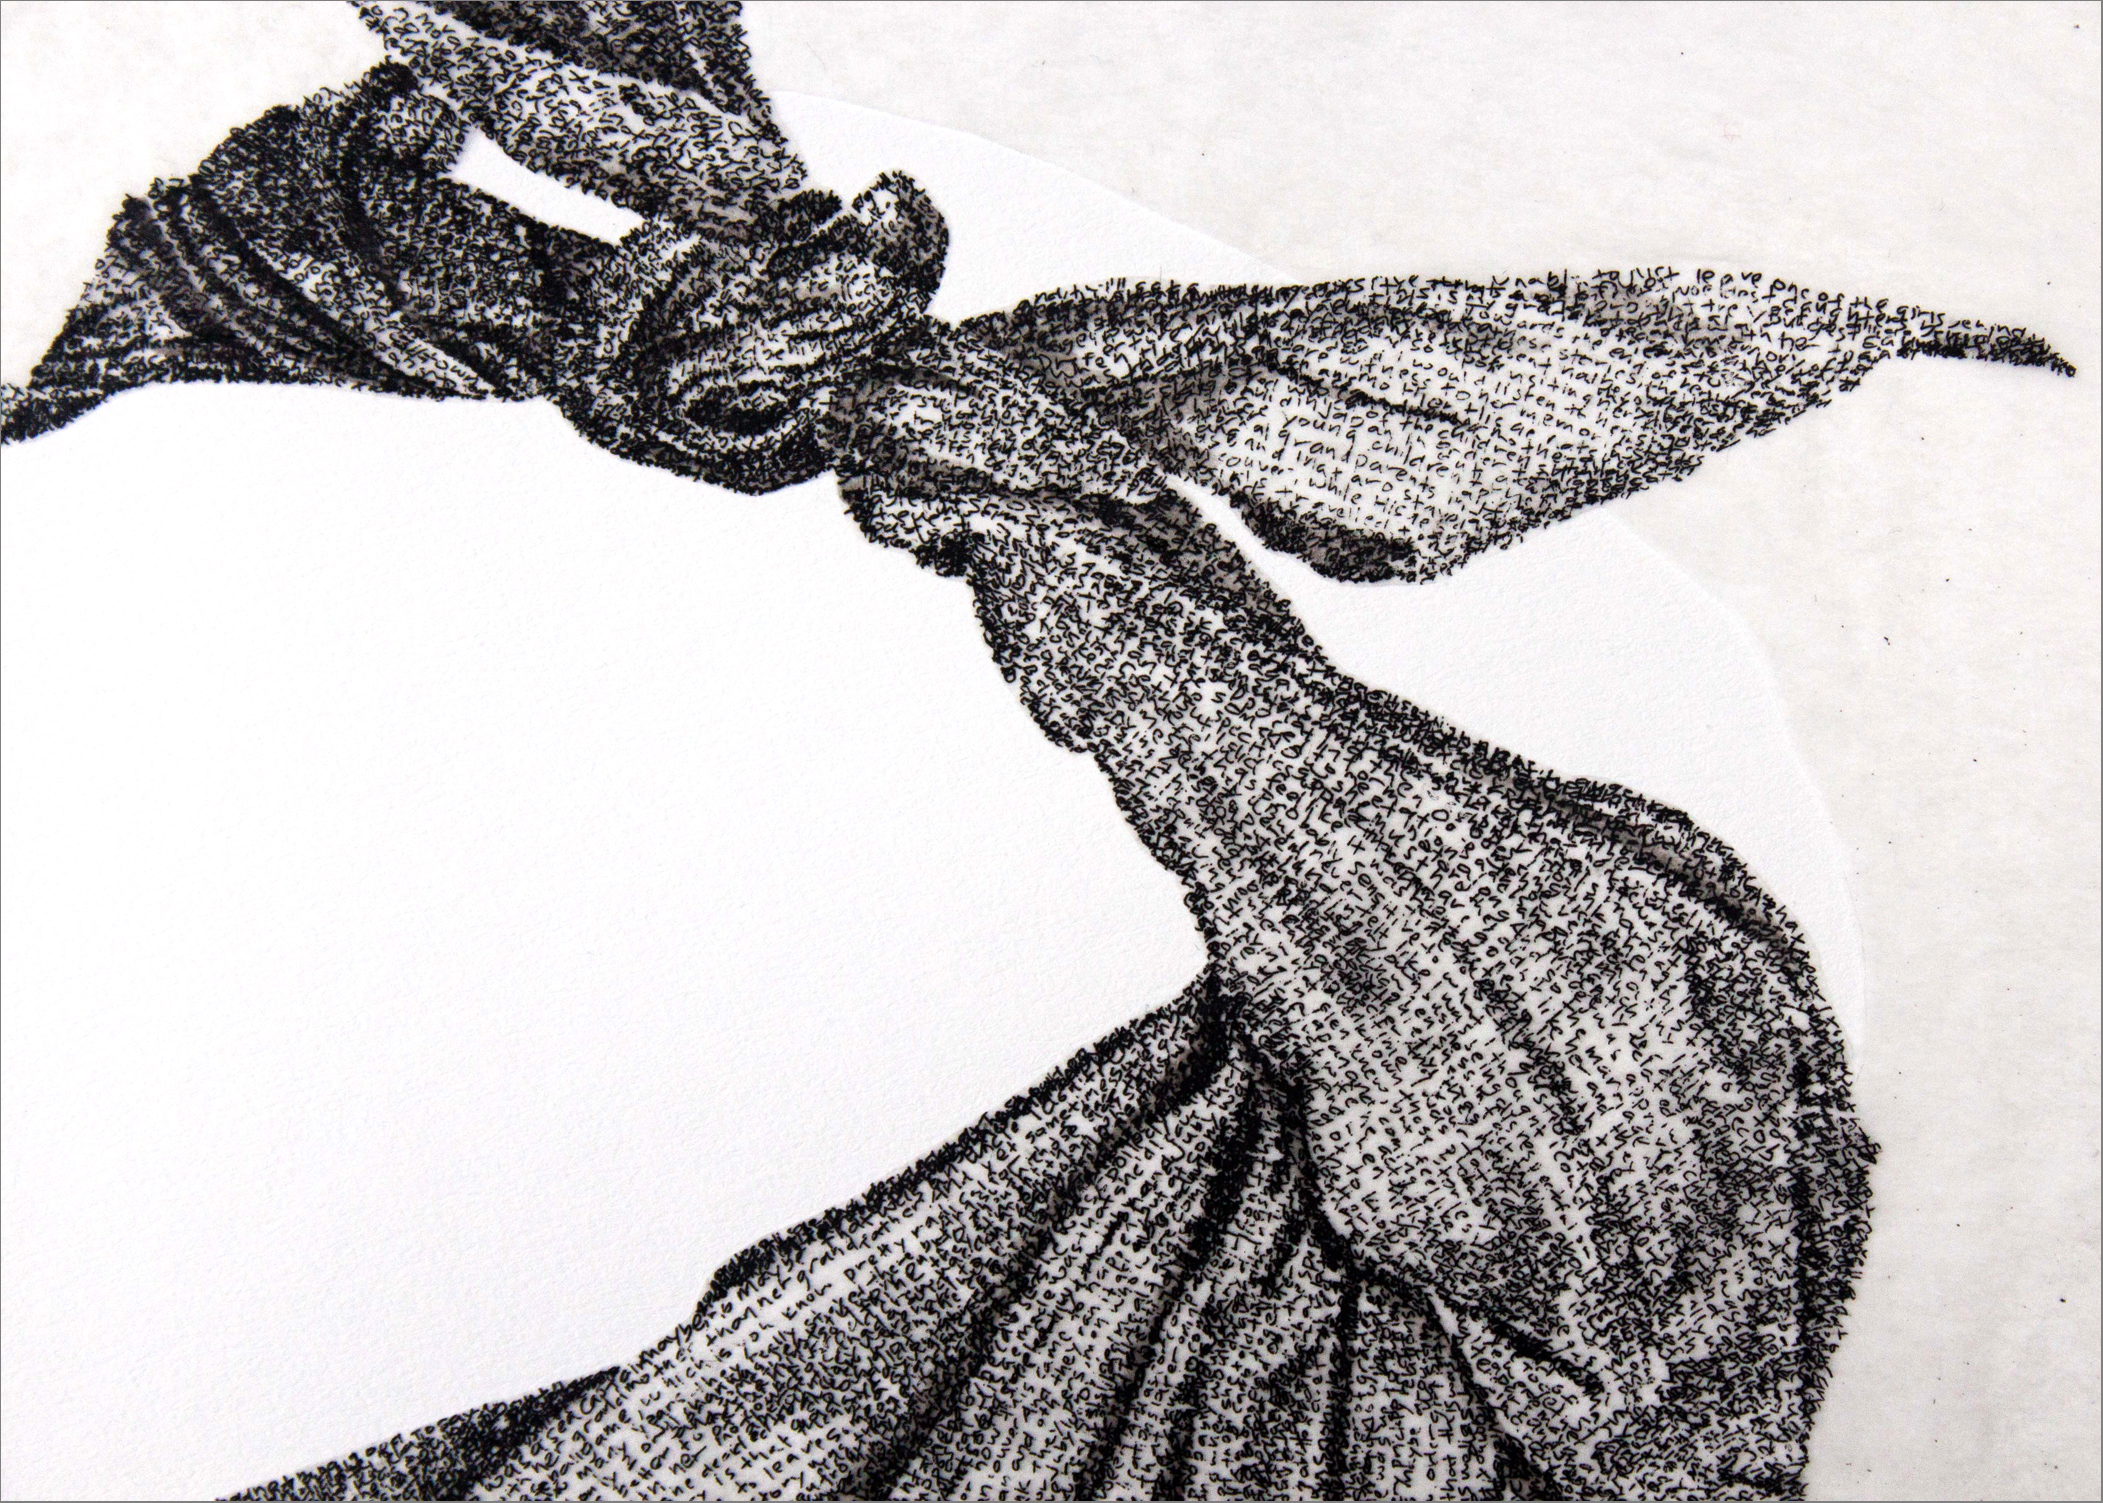 Jeanie Nishimura – Detail 1